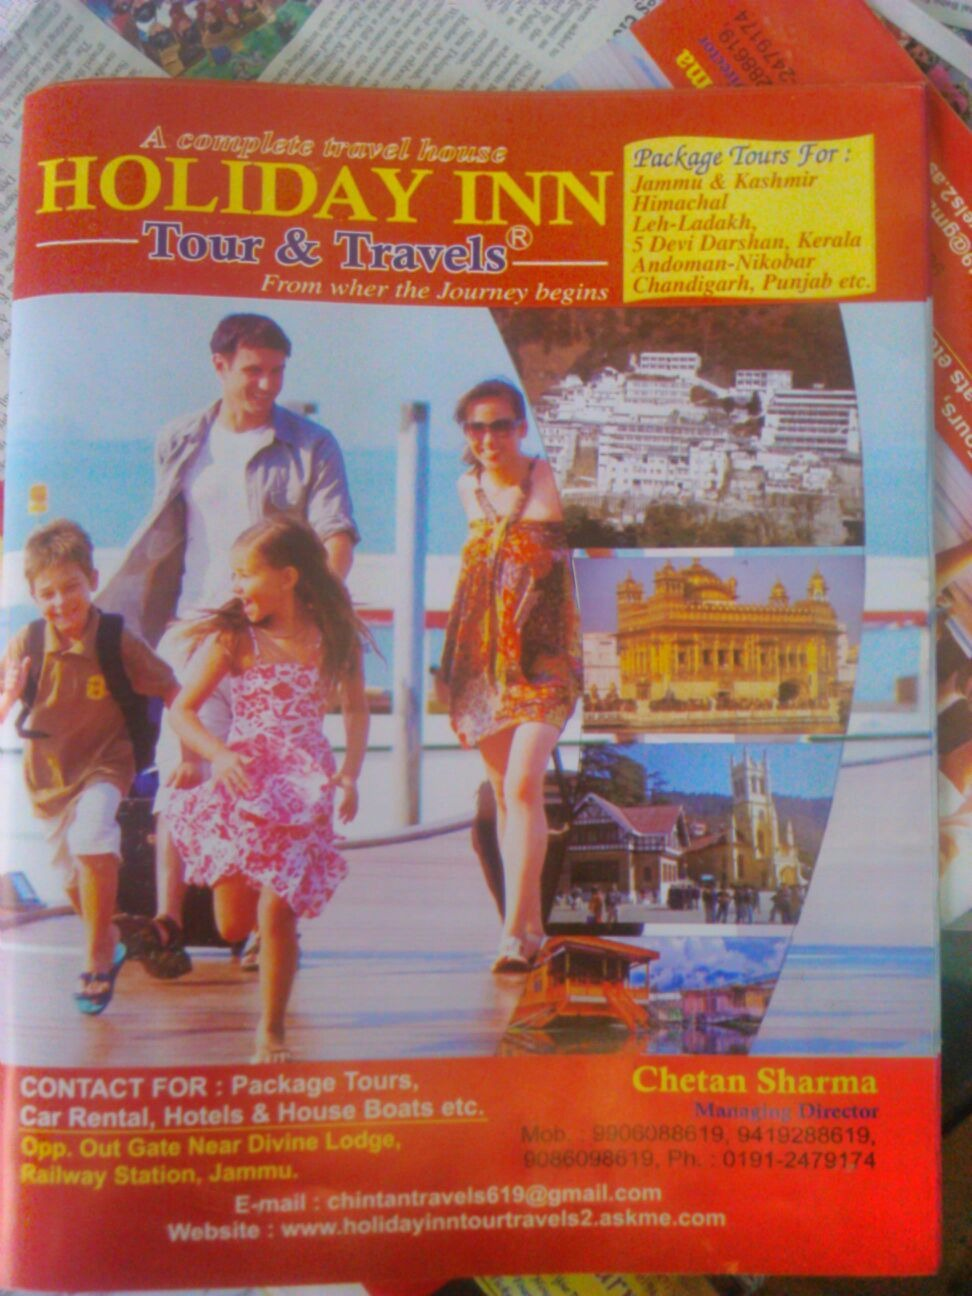 Holiday Inn Tour & Travels